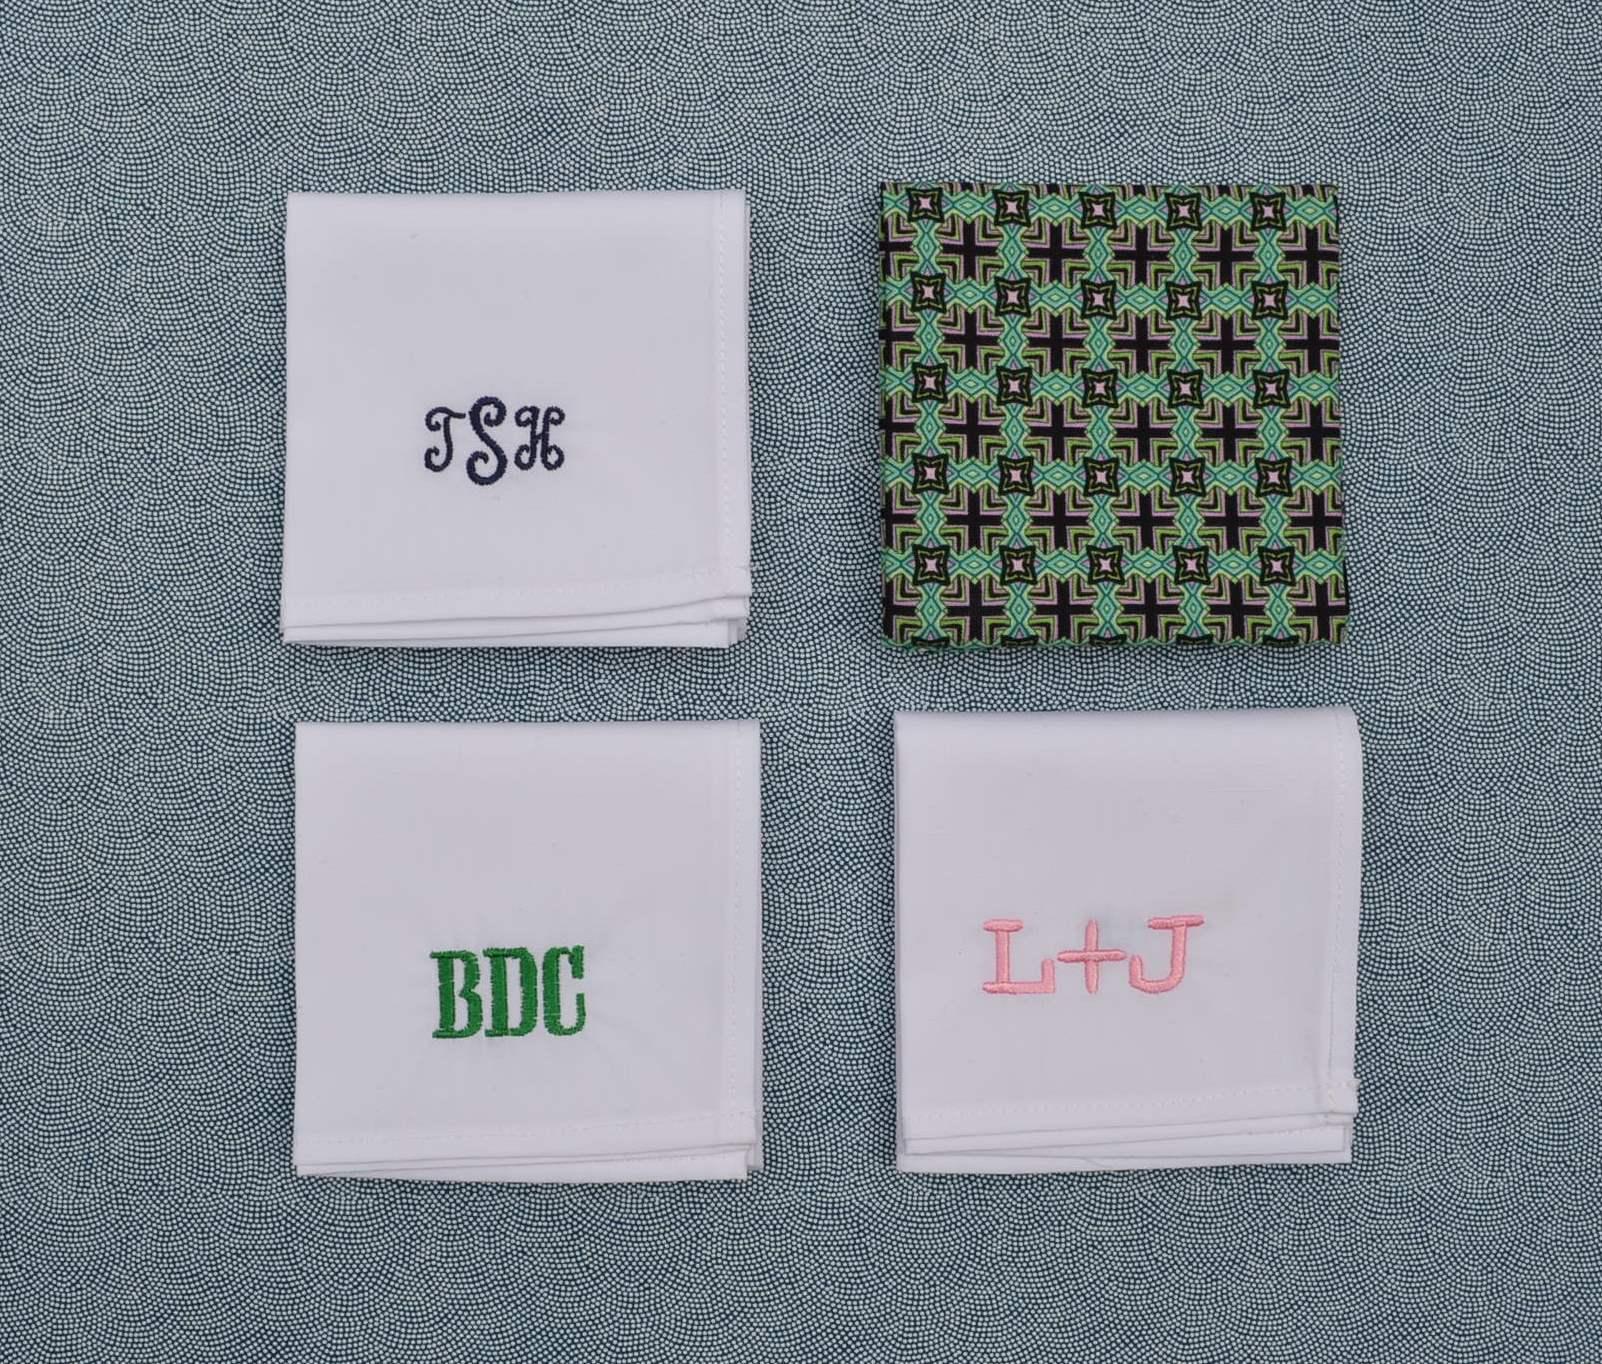 men-s-monogrammed-handkerchiefs-for-spring-summer-2015-v2.jpg